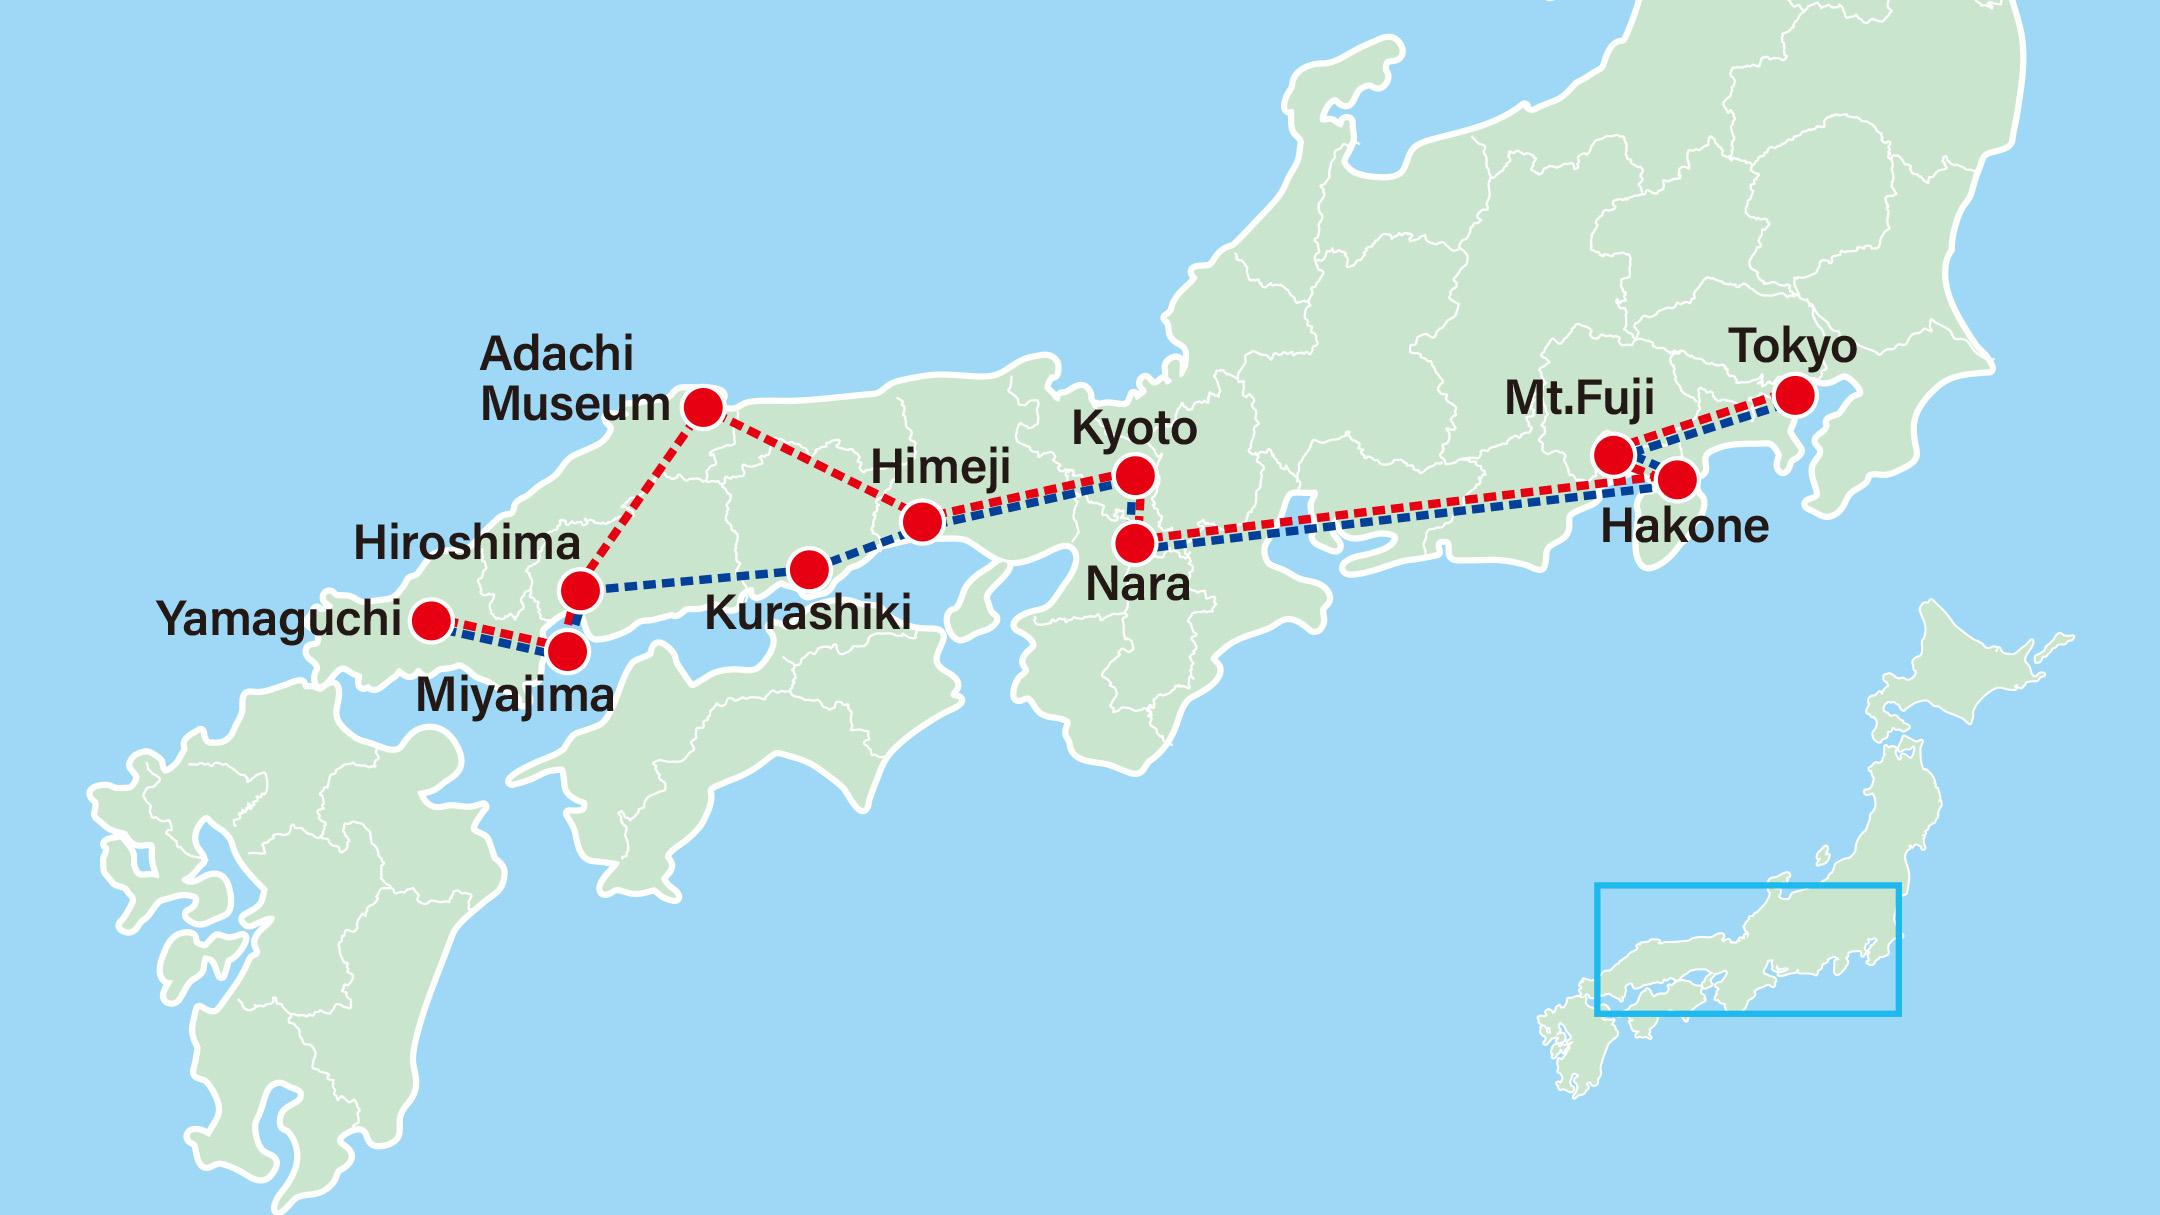 Japanese Ancestry Tour<br>Yamaguchi Suo Oshima-Tokyo-Mt Fuji-Hakone-Nara-Kyoto-Himeji-Adachi Museum-Hiroshima-Miyajima-Suo Island